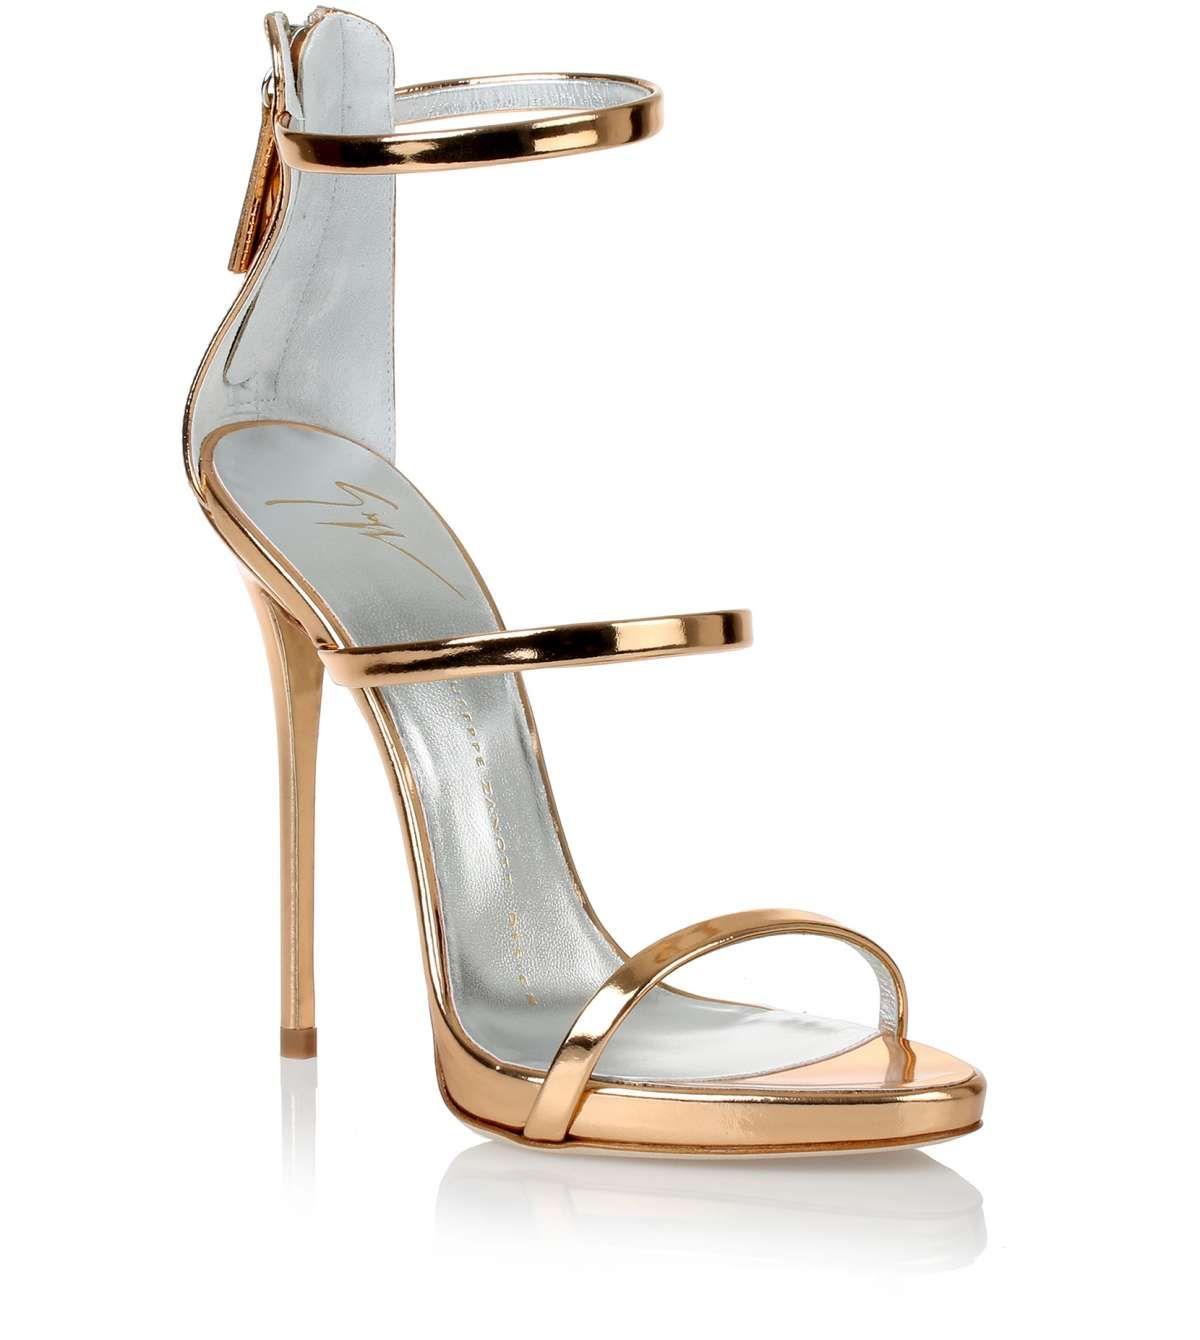 ed8e5a291d2 Metallic rose gold sandal Giuseppe Zanotti. These are classy. Would ...